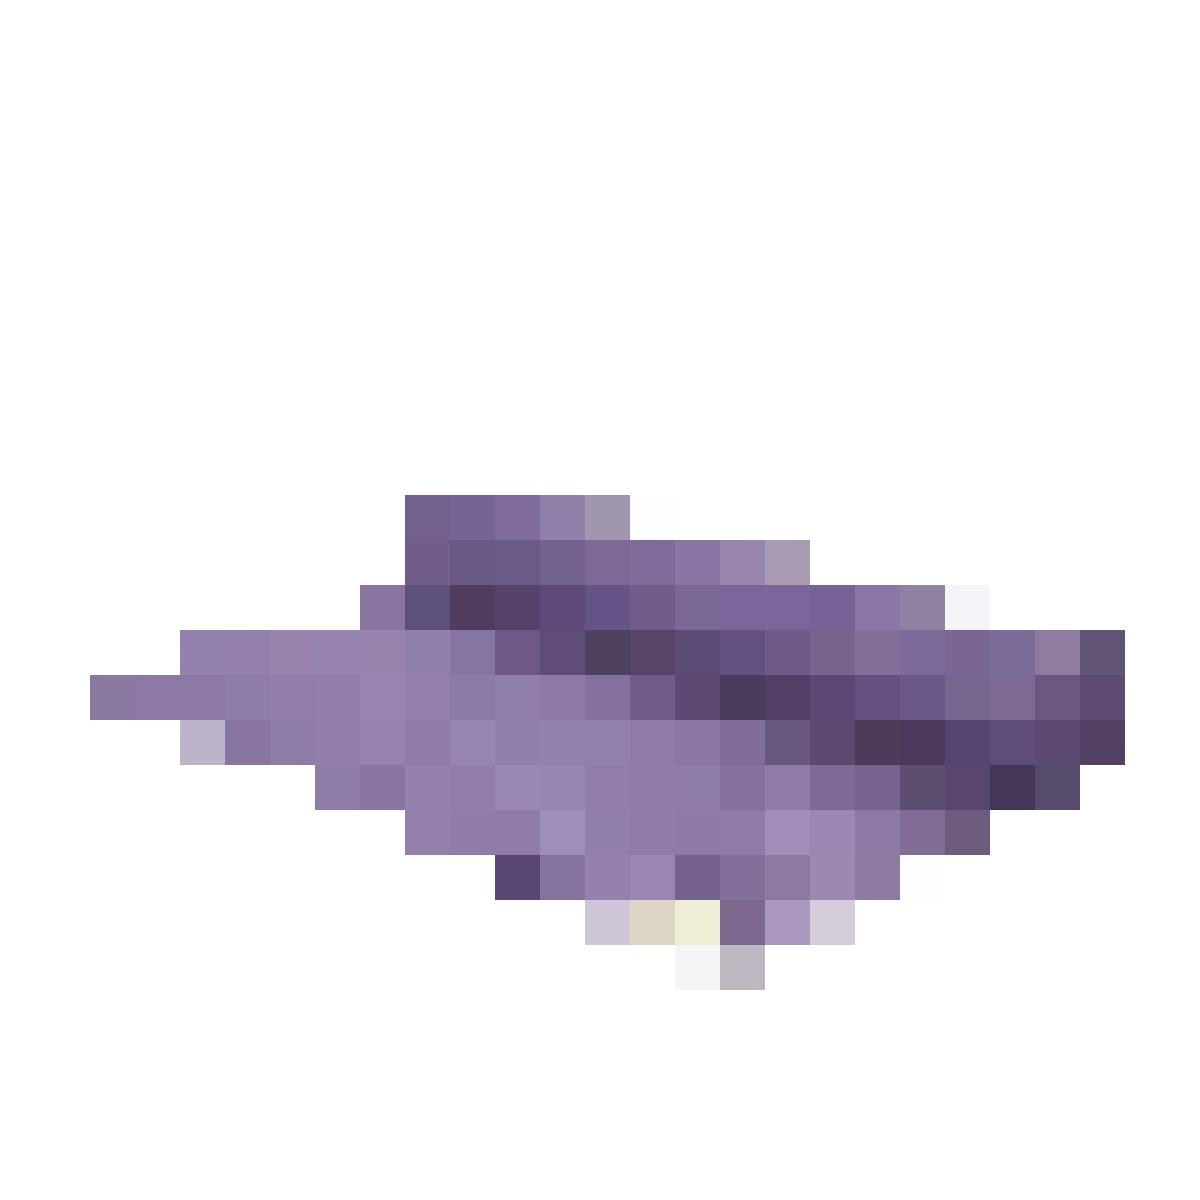 Relaxation: tapis de yoga Jade Yoga, violet, 84 fr. 95, sur microspot.ch.